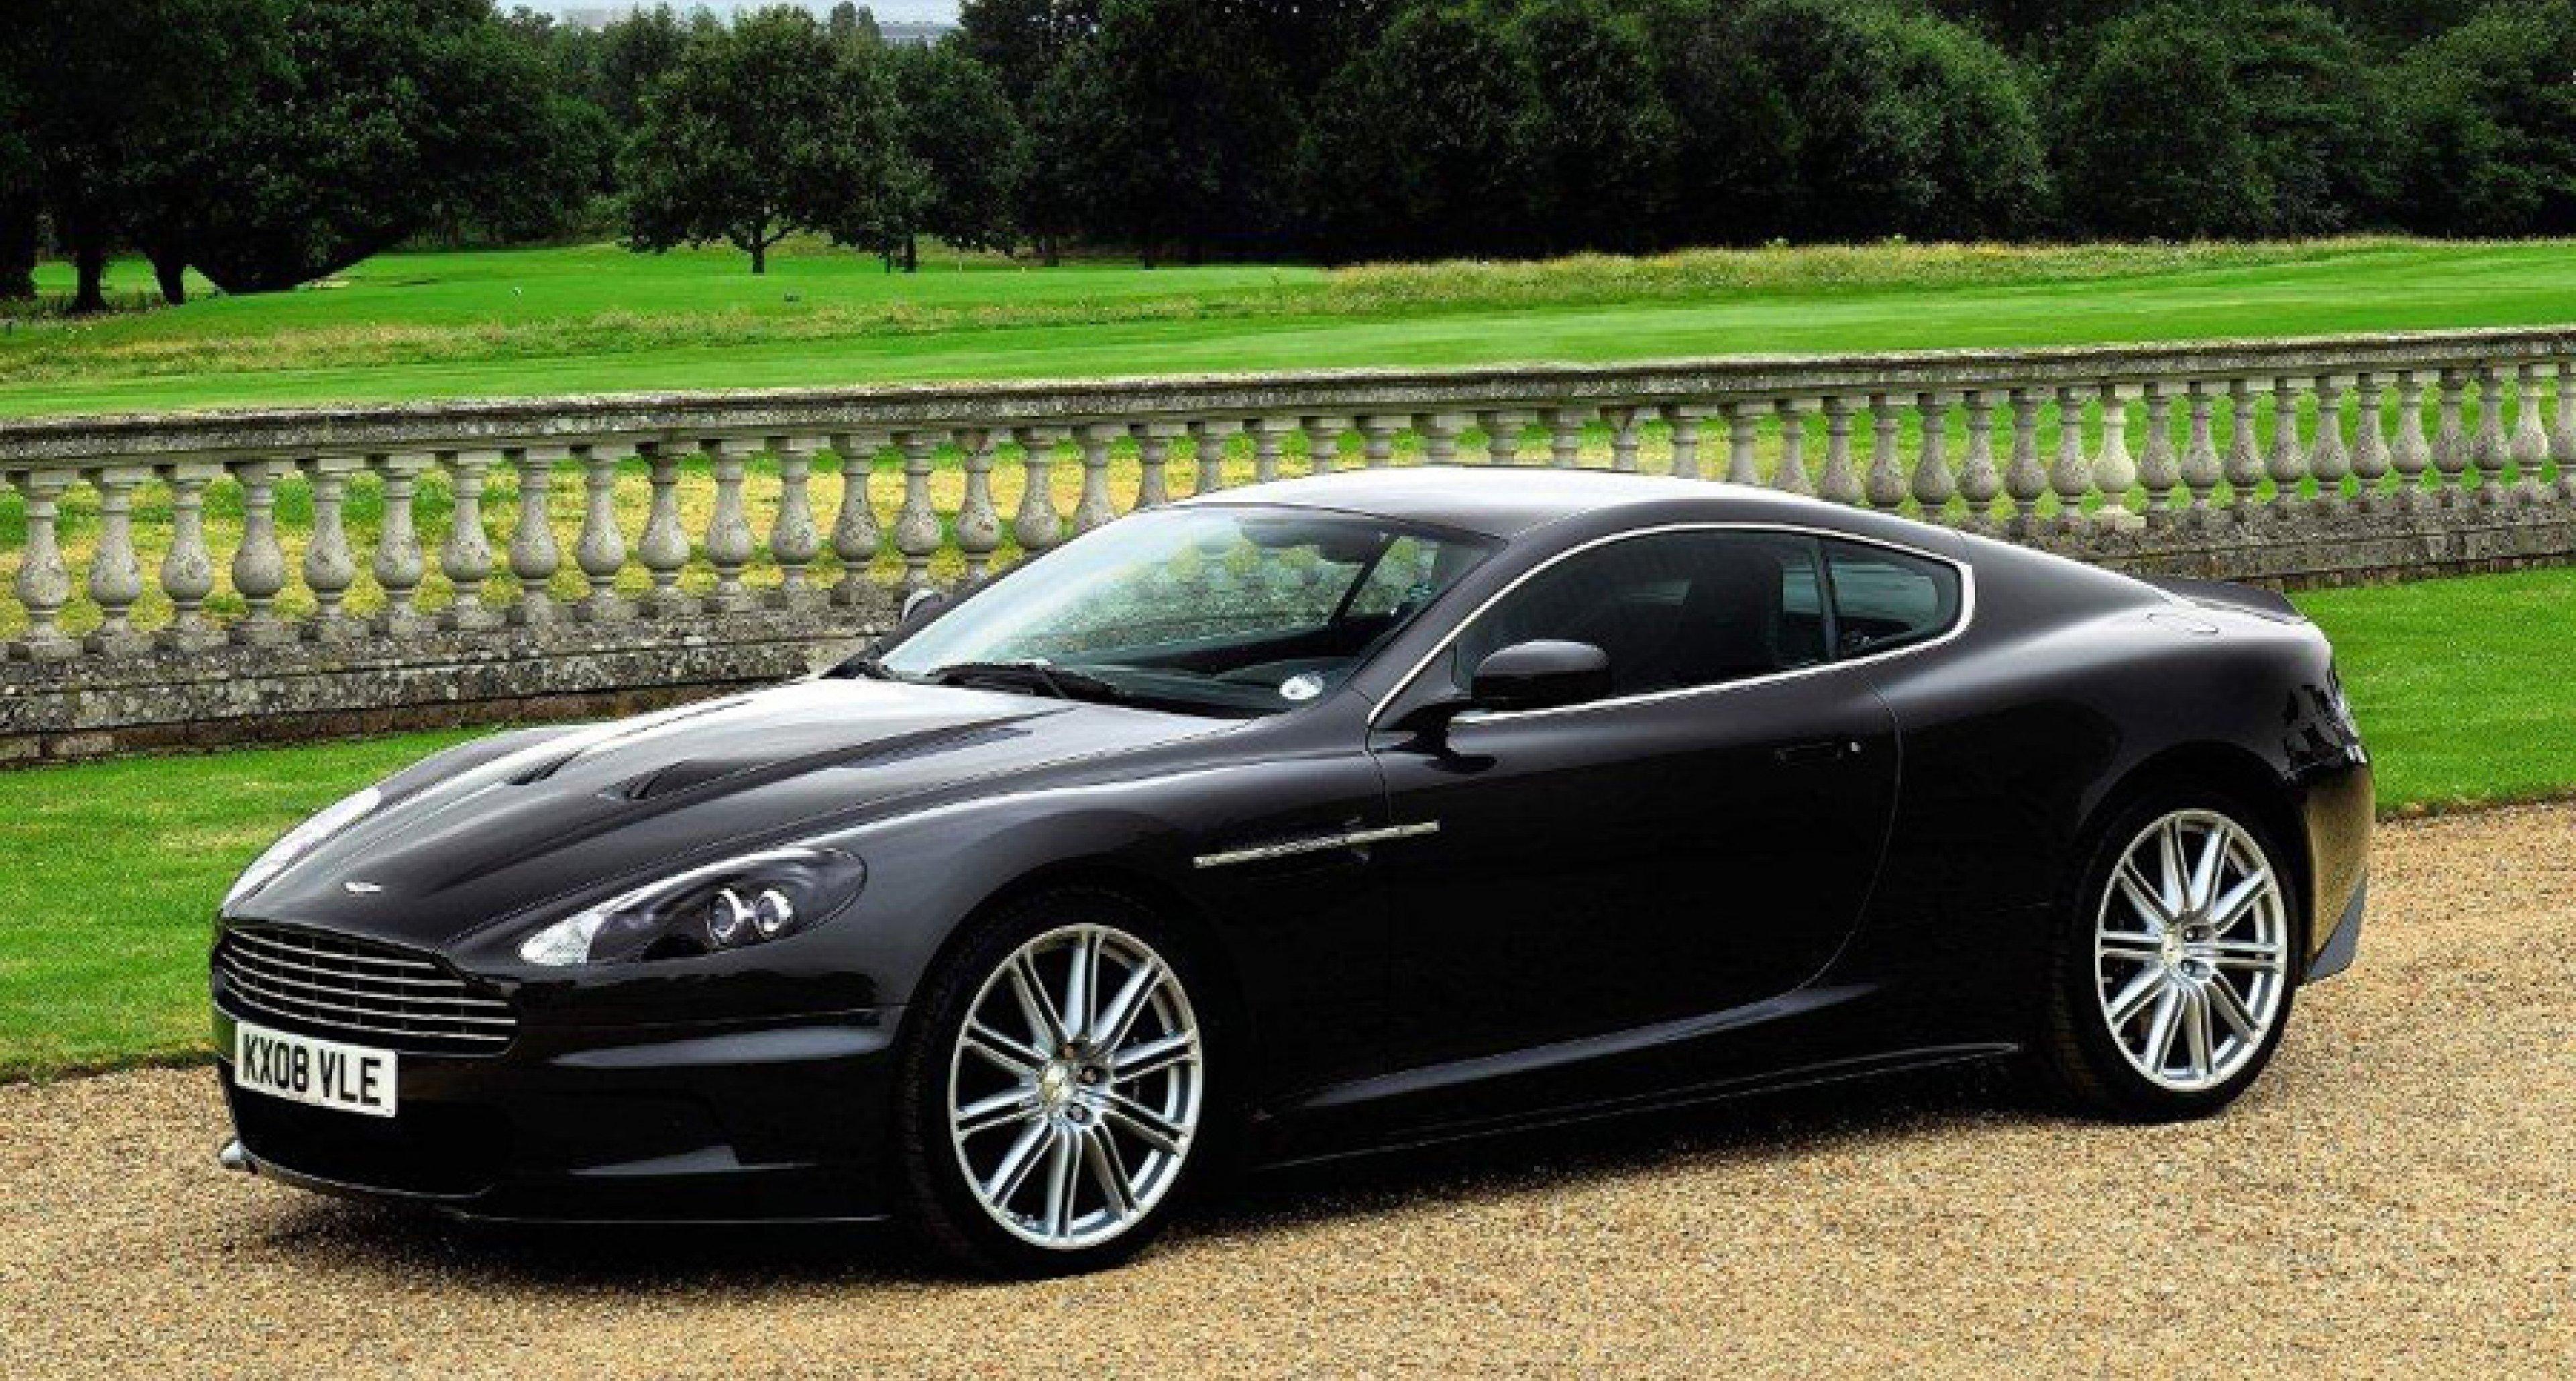 James Bond S Aston Martin Dbs Sells For 241 250 Classic